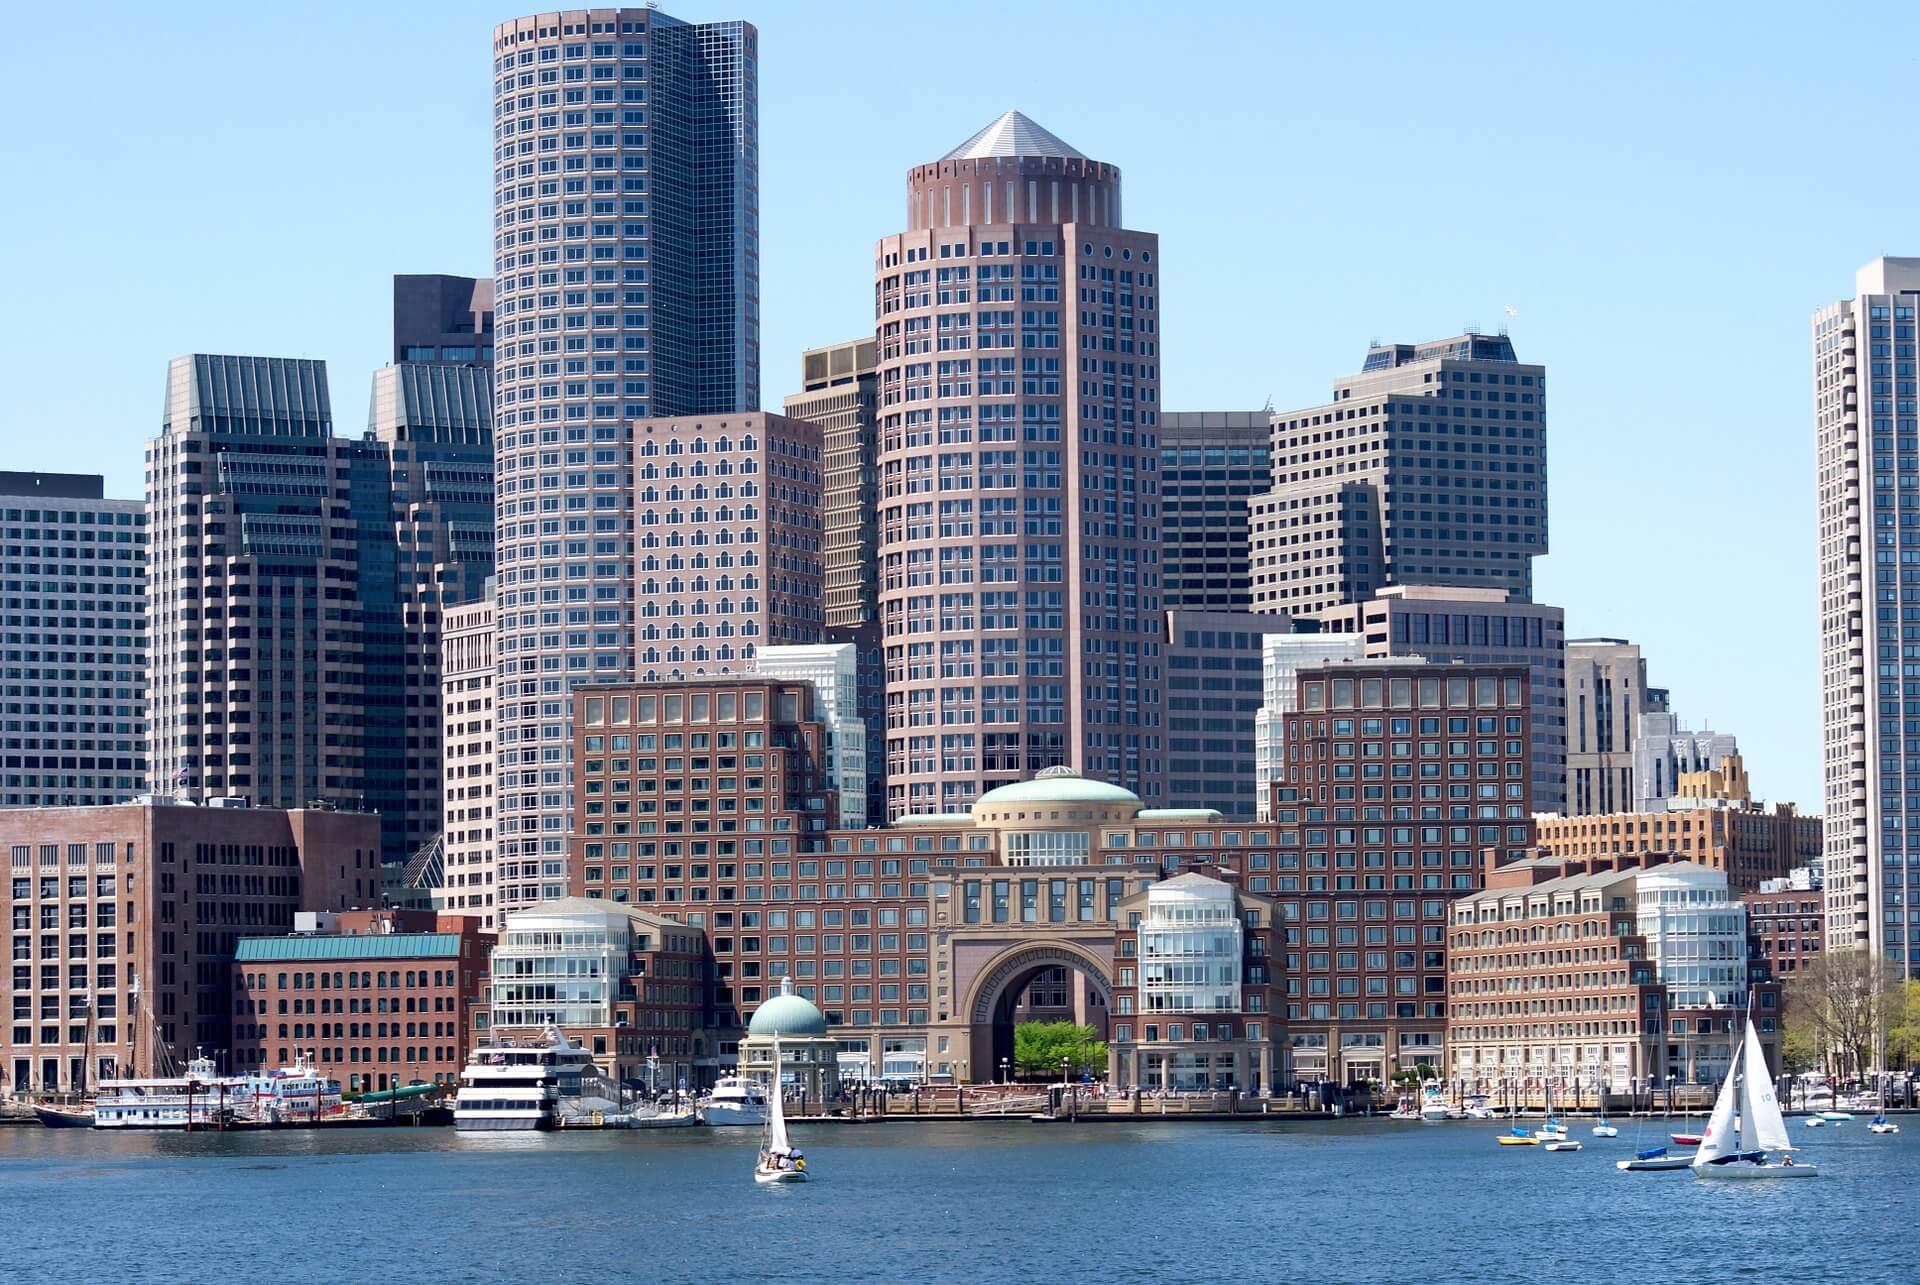 boston-1448339_1920 (1)